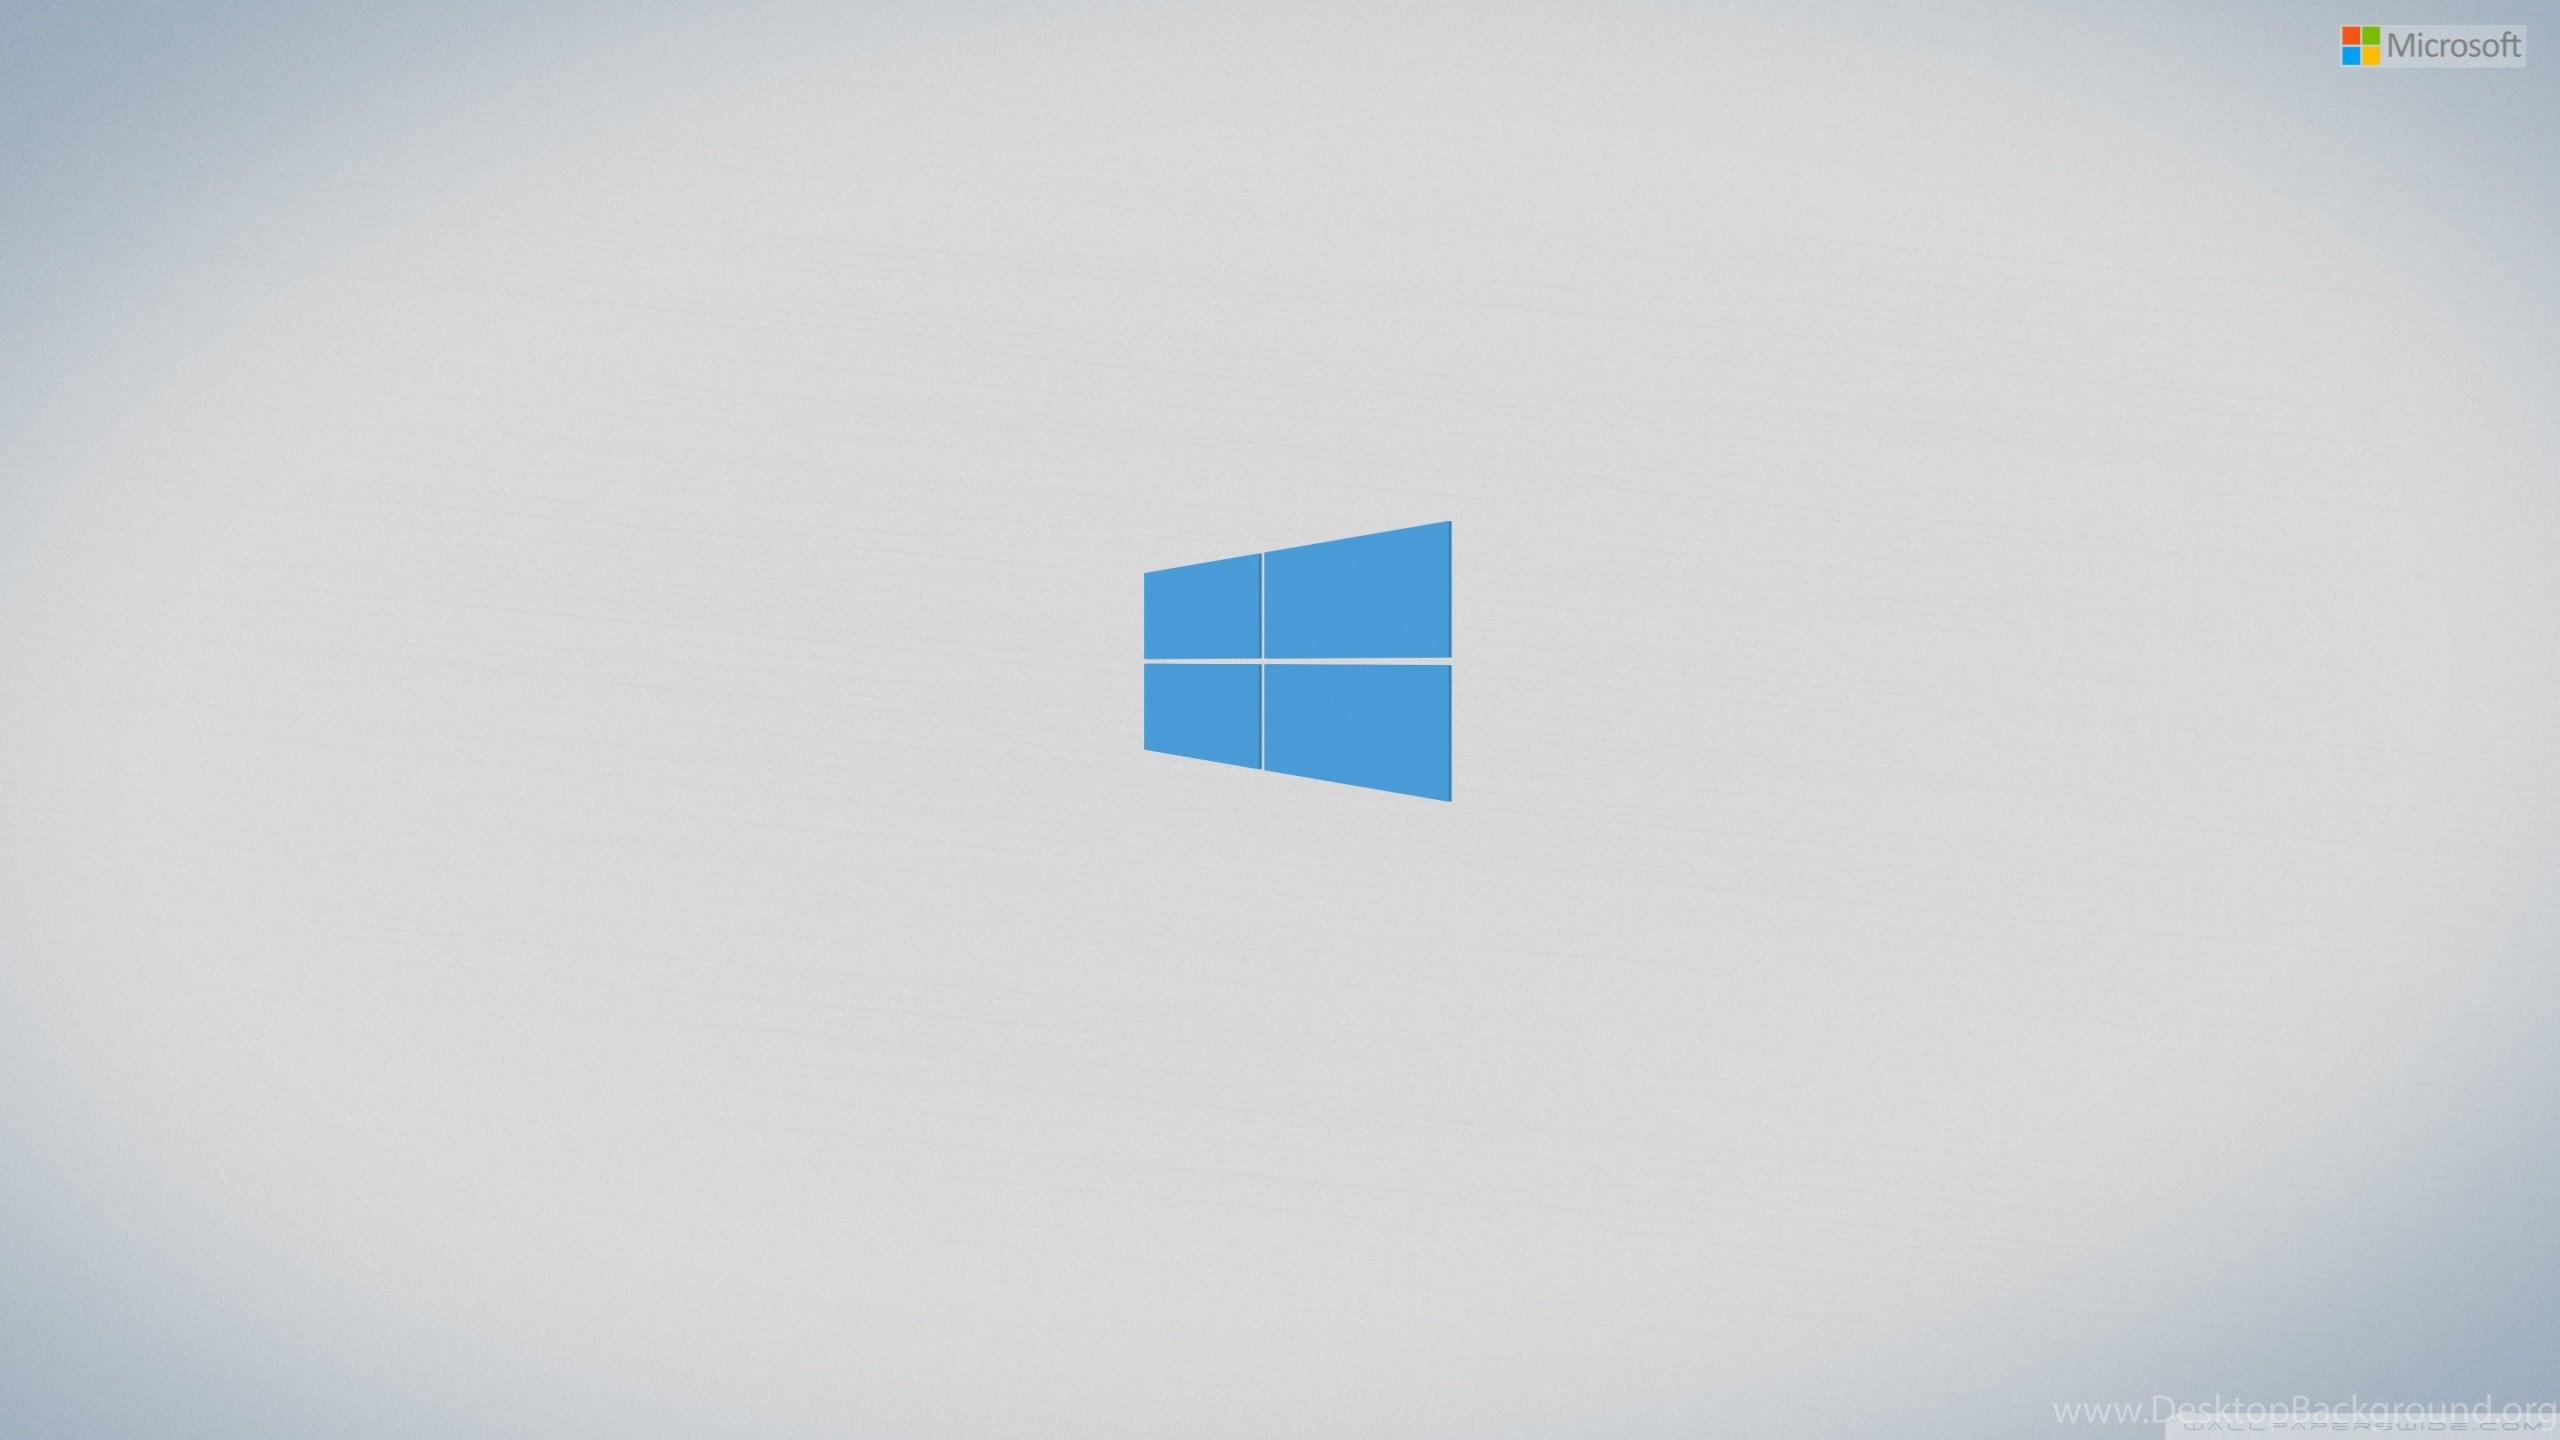 microsoft windows 8 blue hd desktop wallpapers : high definition